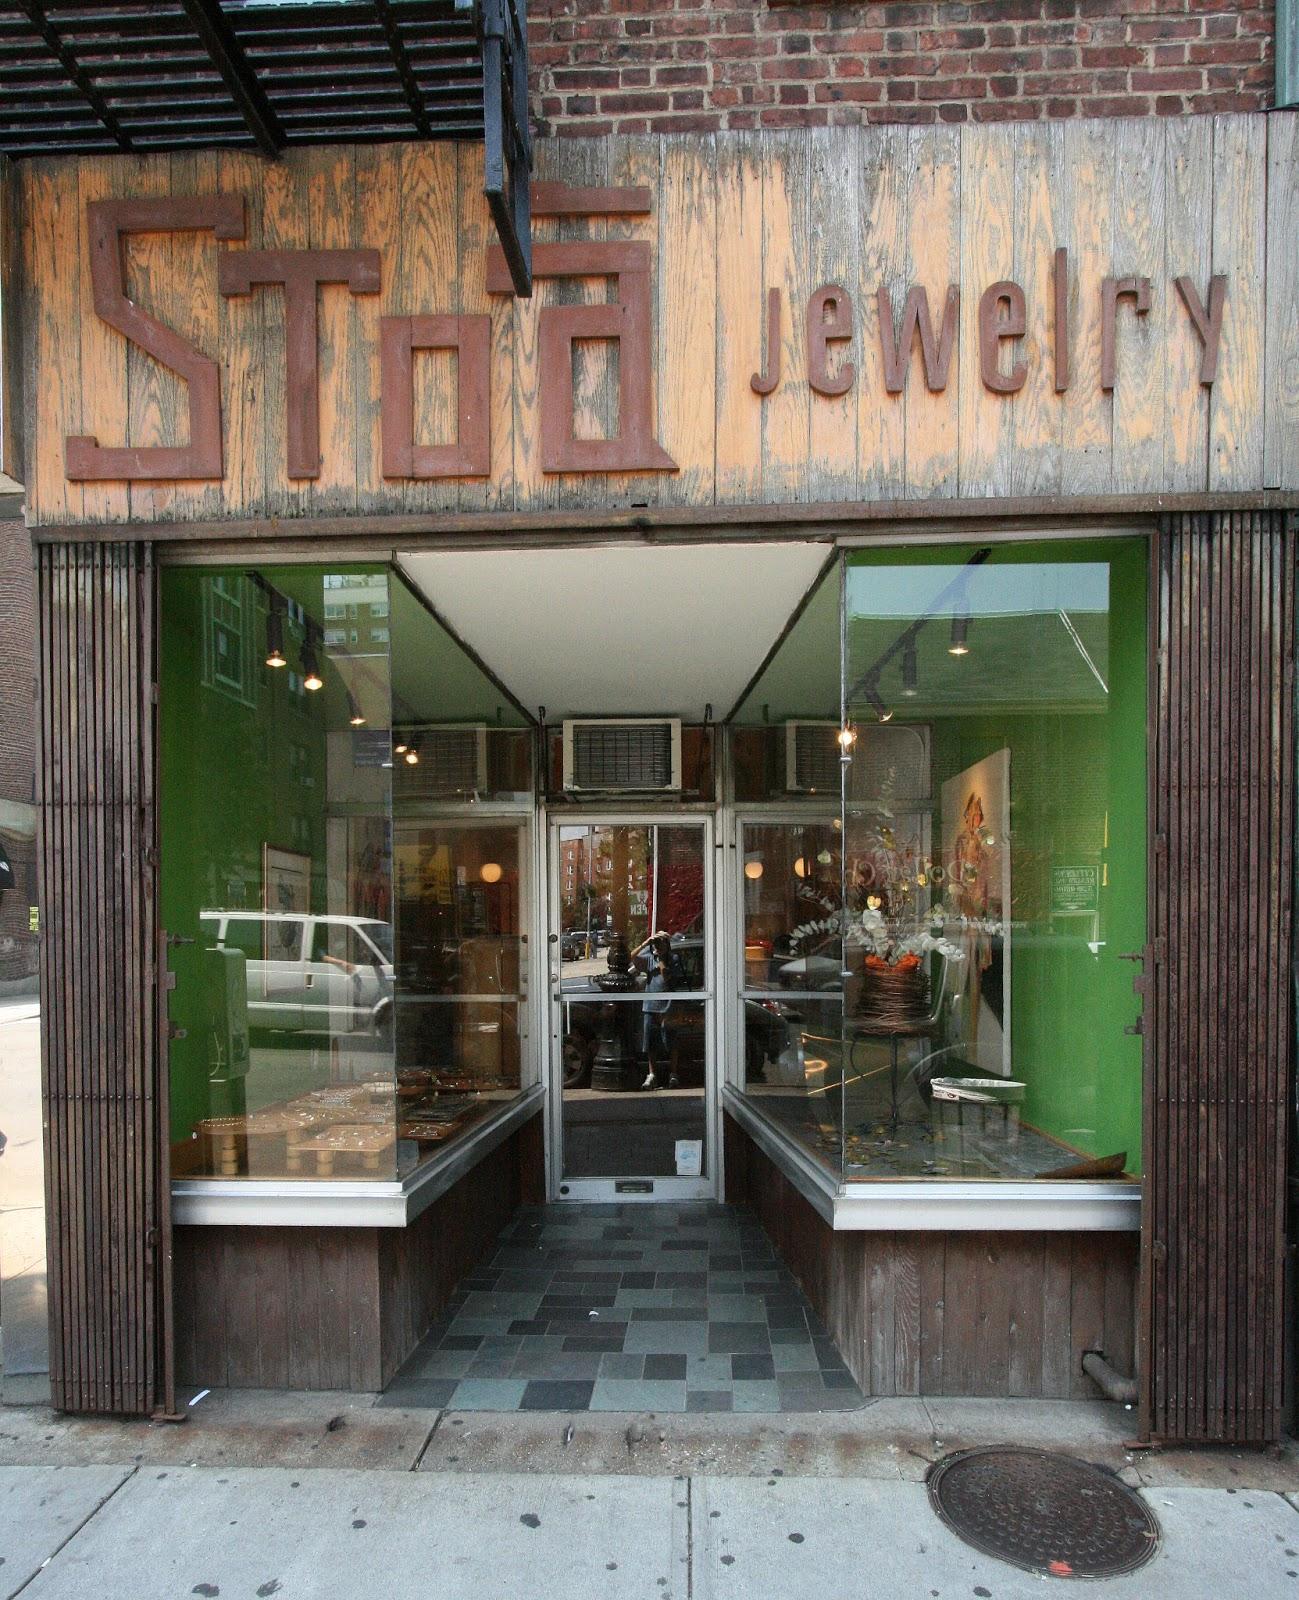 Austin Street Stores : austin, street, stores, Jewelry, Stores, Austin, Street, Forest, Hills